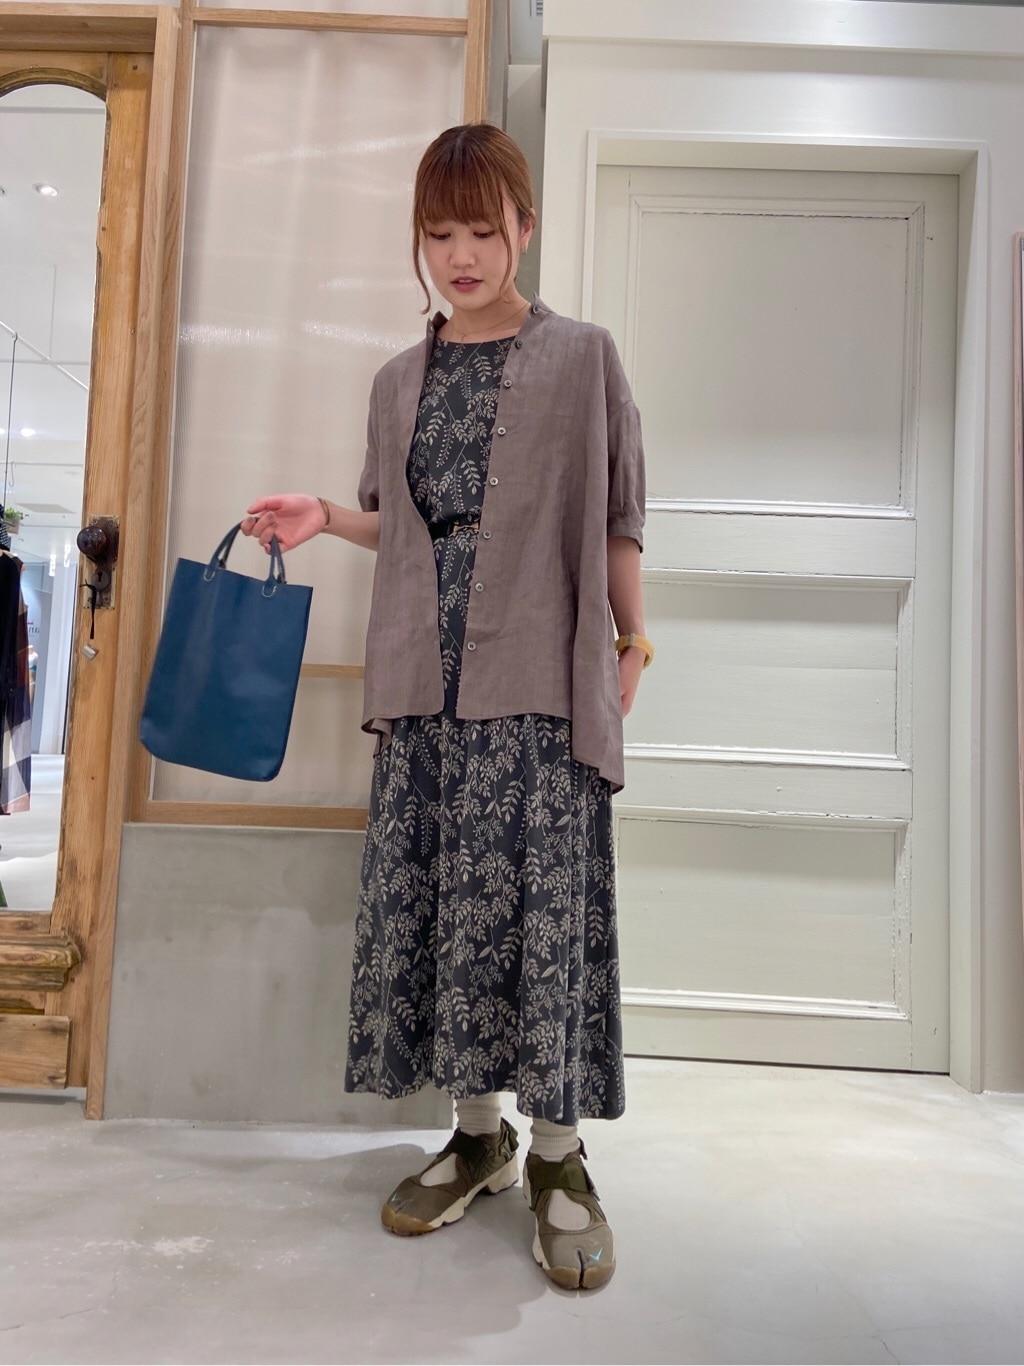 bulle de savon 渋谷スクランブルスクエア 身長:160cm 2020.06.19